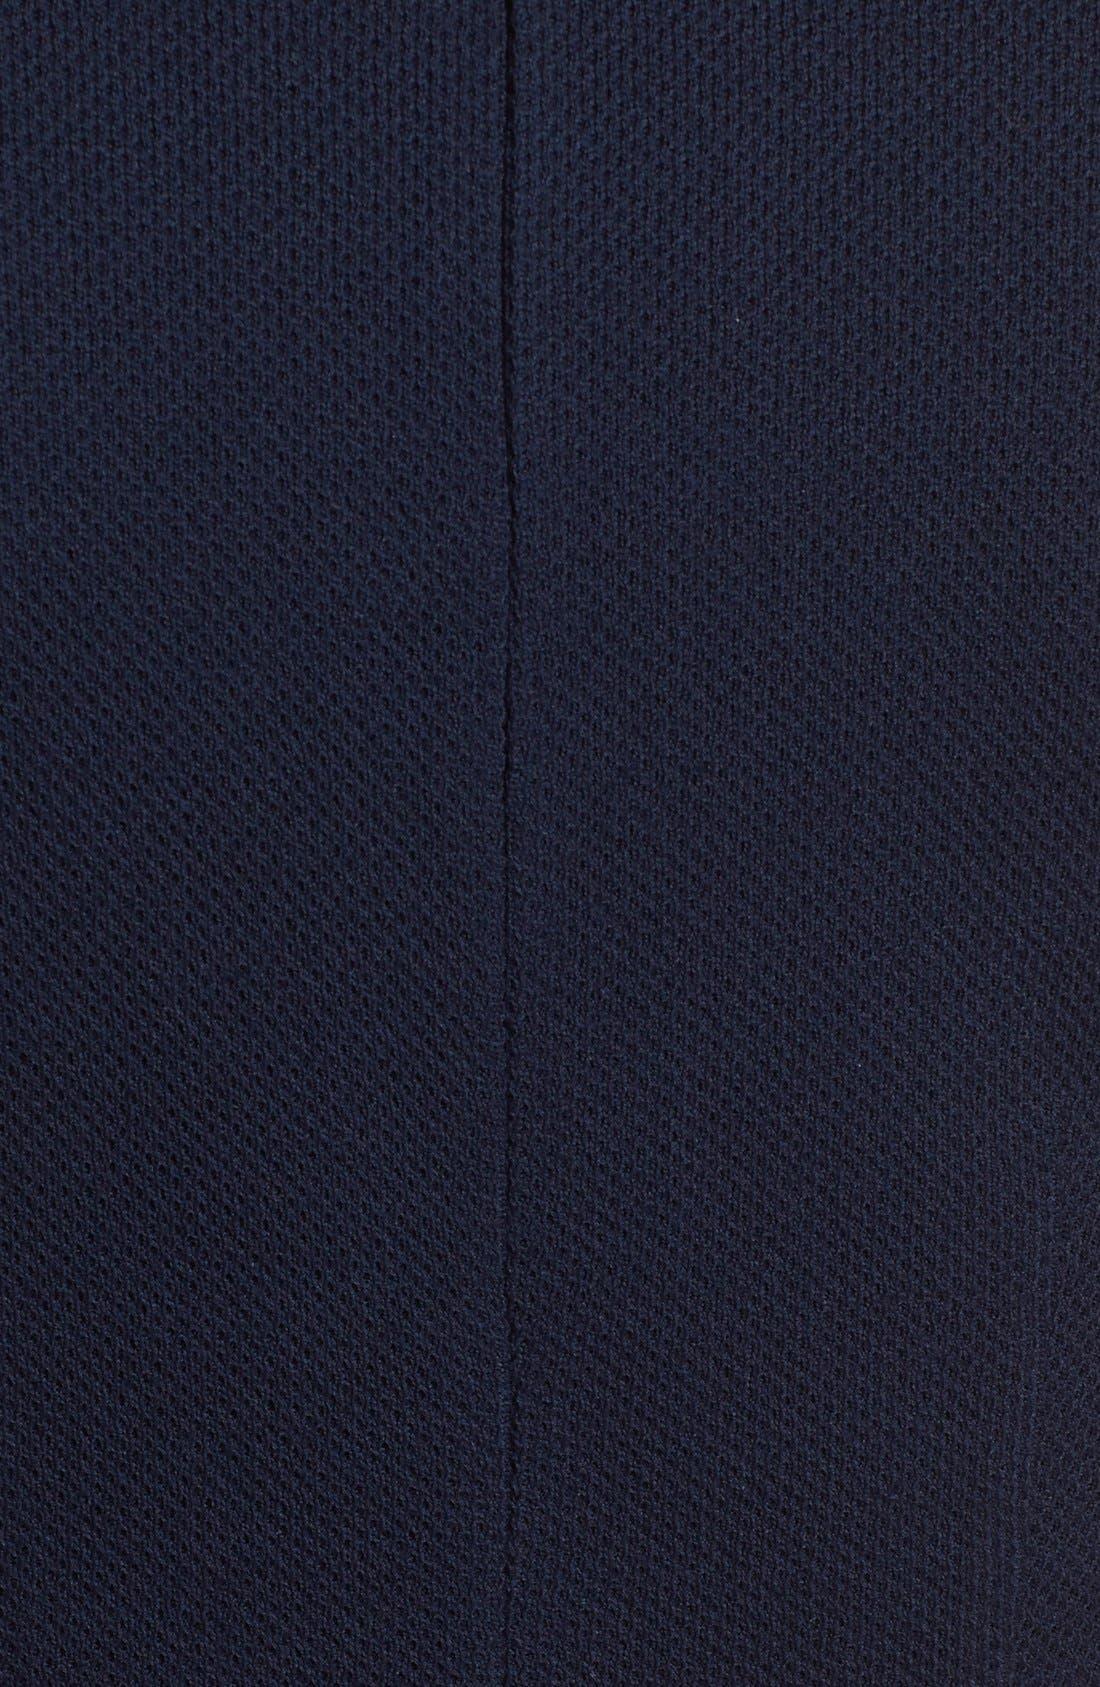 Alternate Image 3  - St. John Collection Peplum Milano Piqué Knit Dress